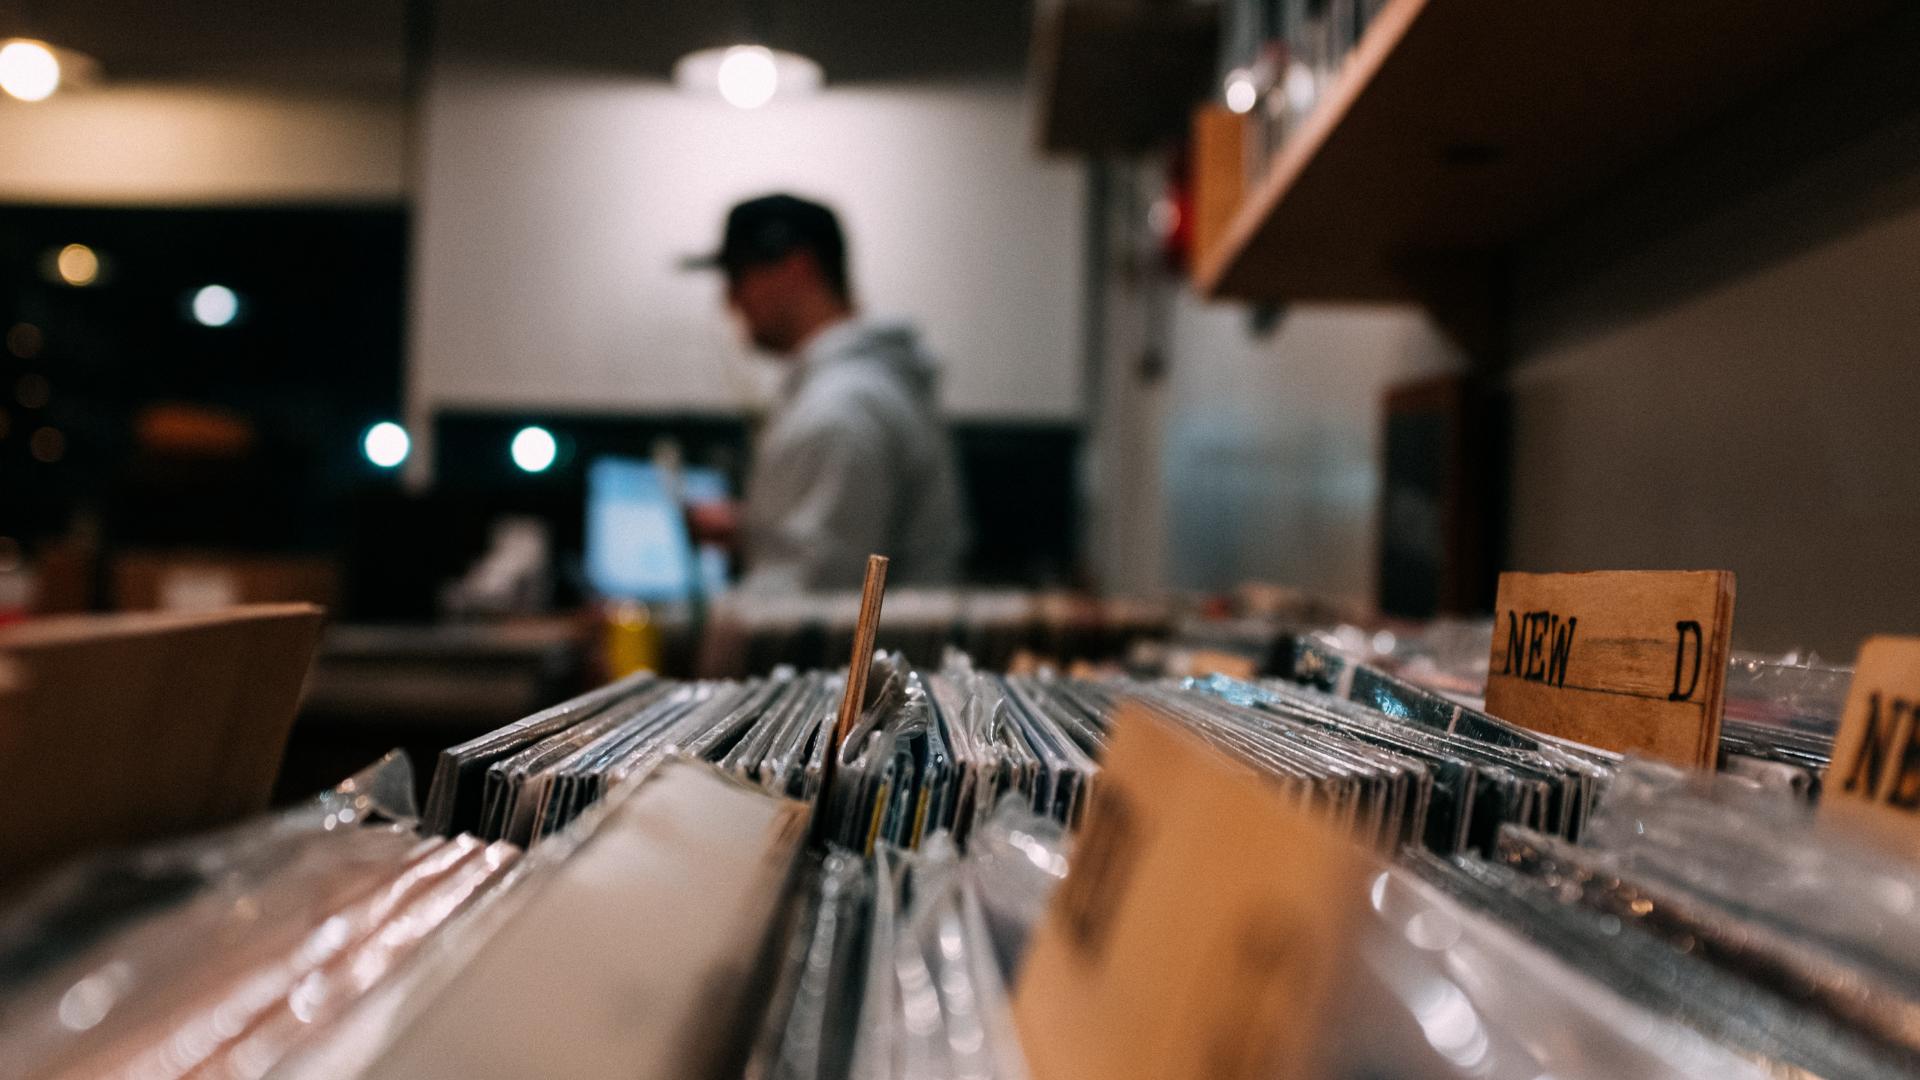 record store vinyl organization close-up